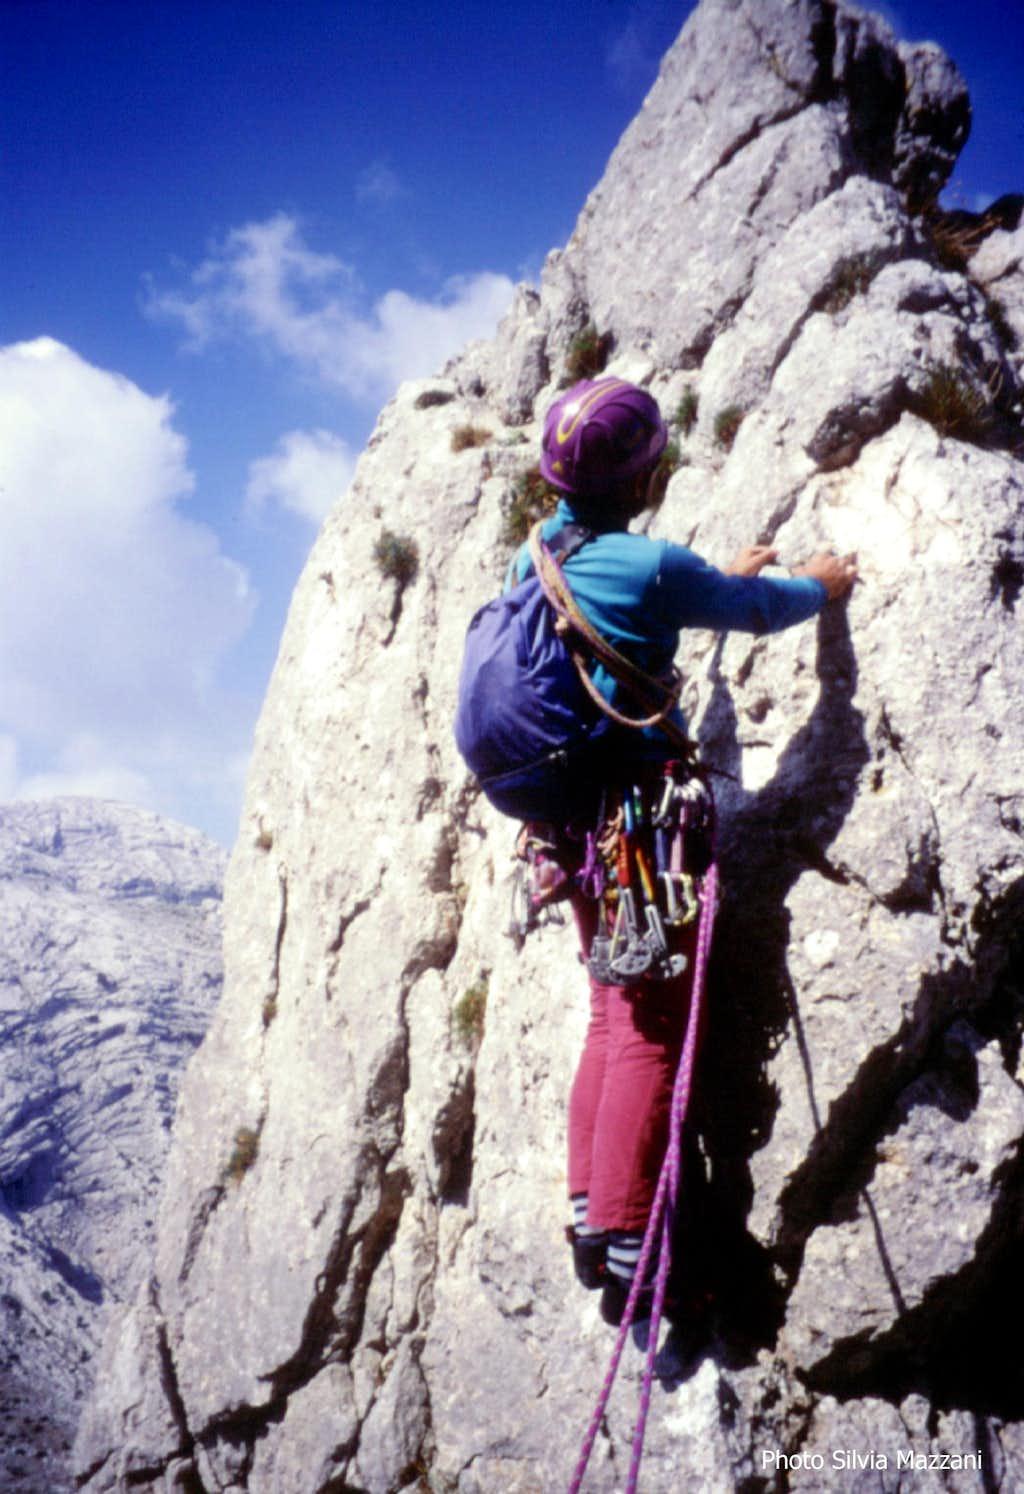 Cusidore, along the classic NW ridge